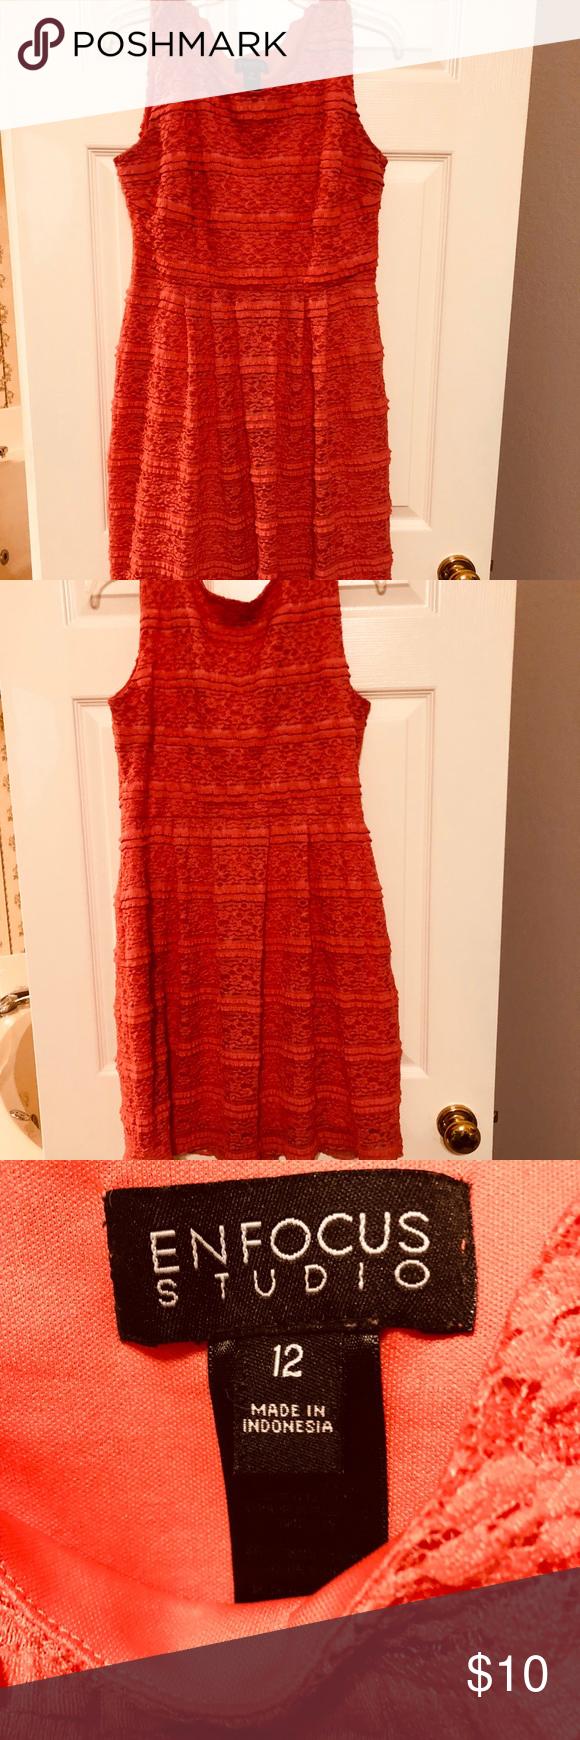 Enfocus studio coral summer dress size cute by also pinterest rh co